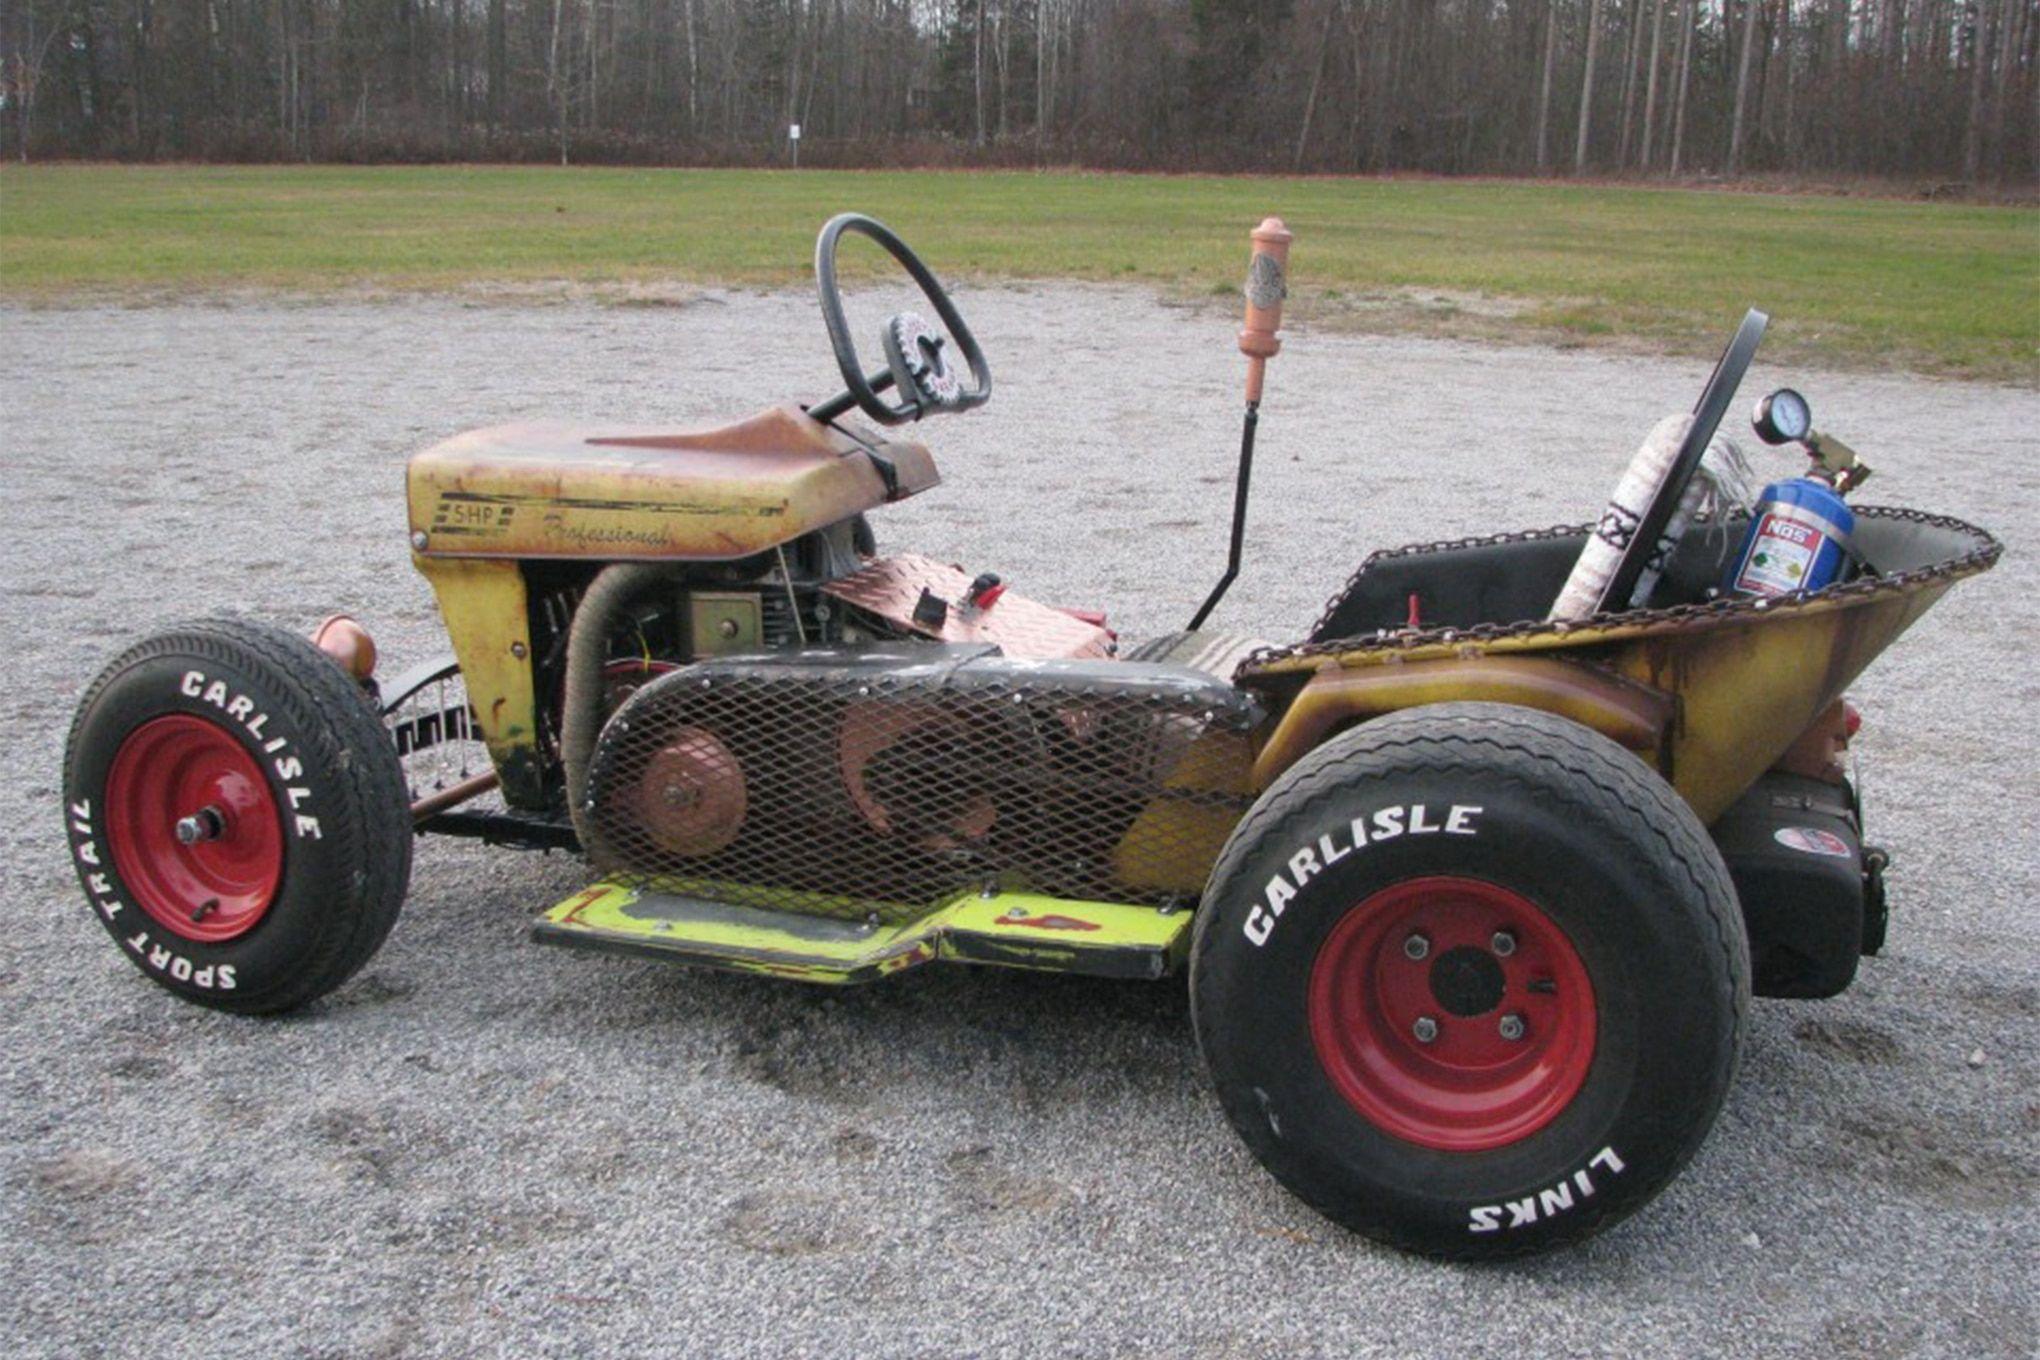 The Diesel Weasel Mow Cart Is Home Built Rat Rod Mayhem Hot Rod Network Homemade Go Kart Rat Rod Rat Rods Truck